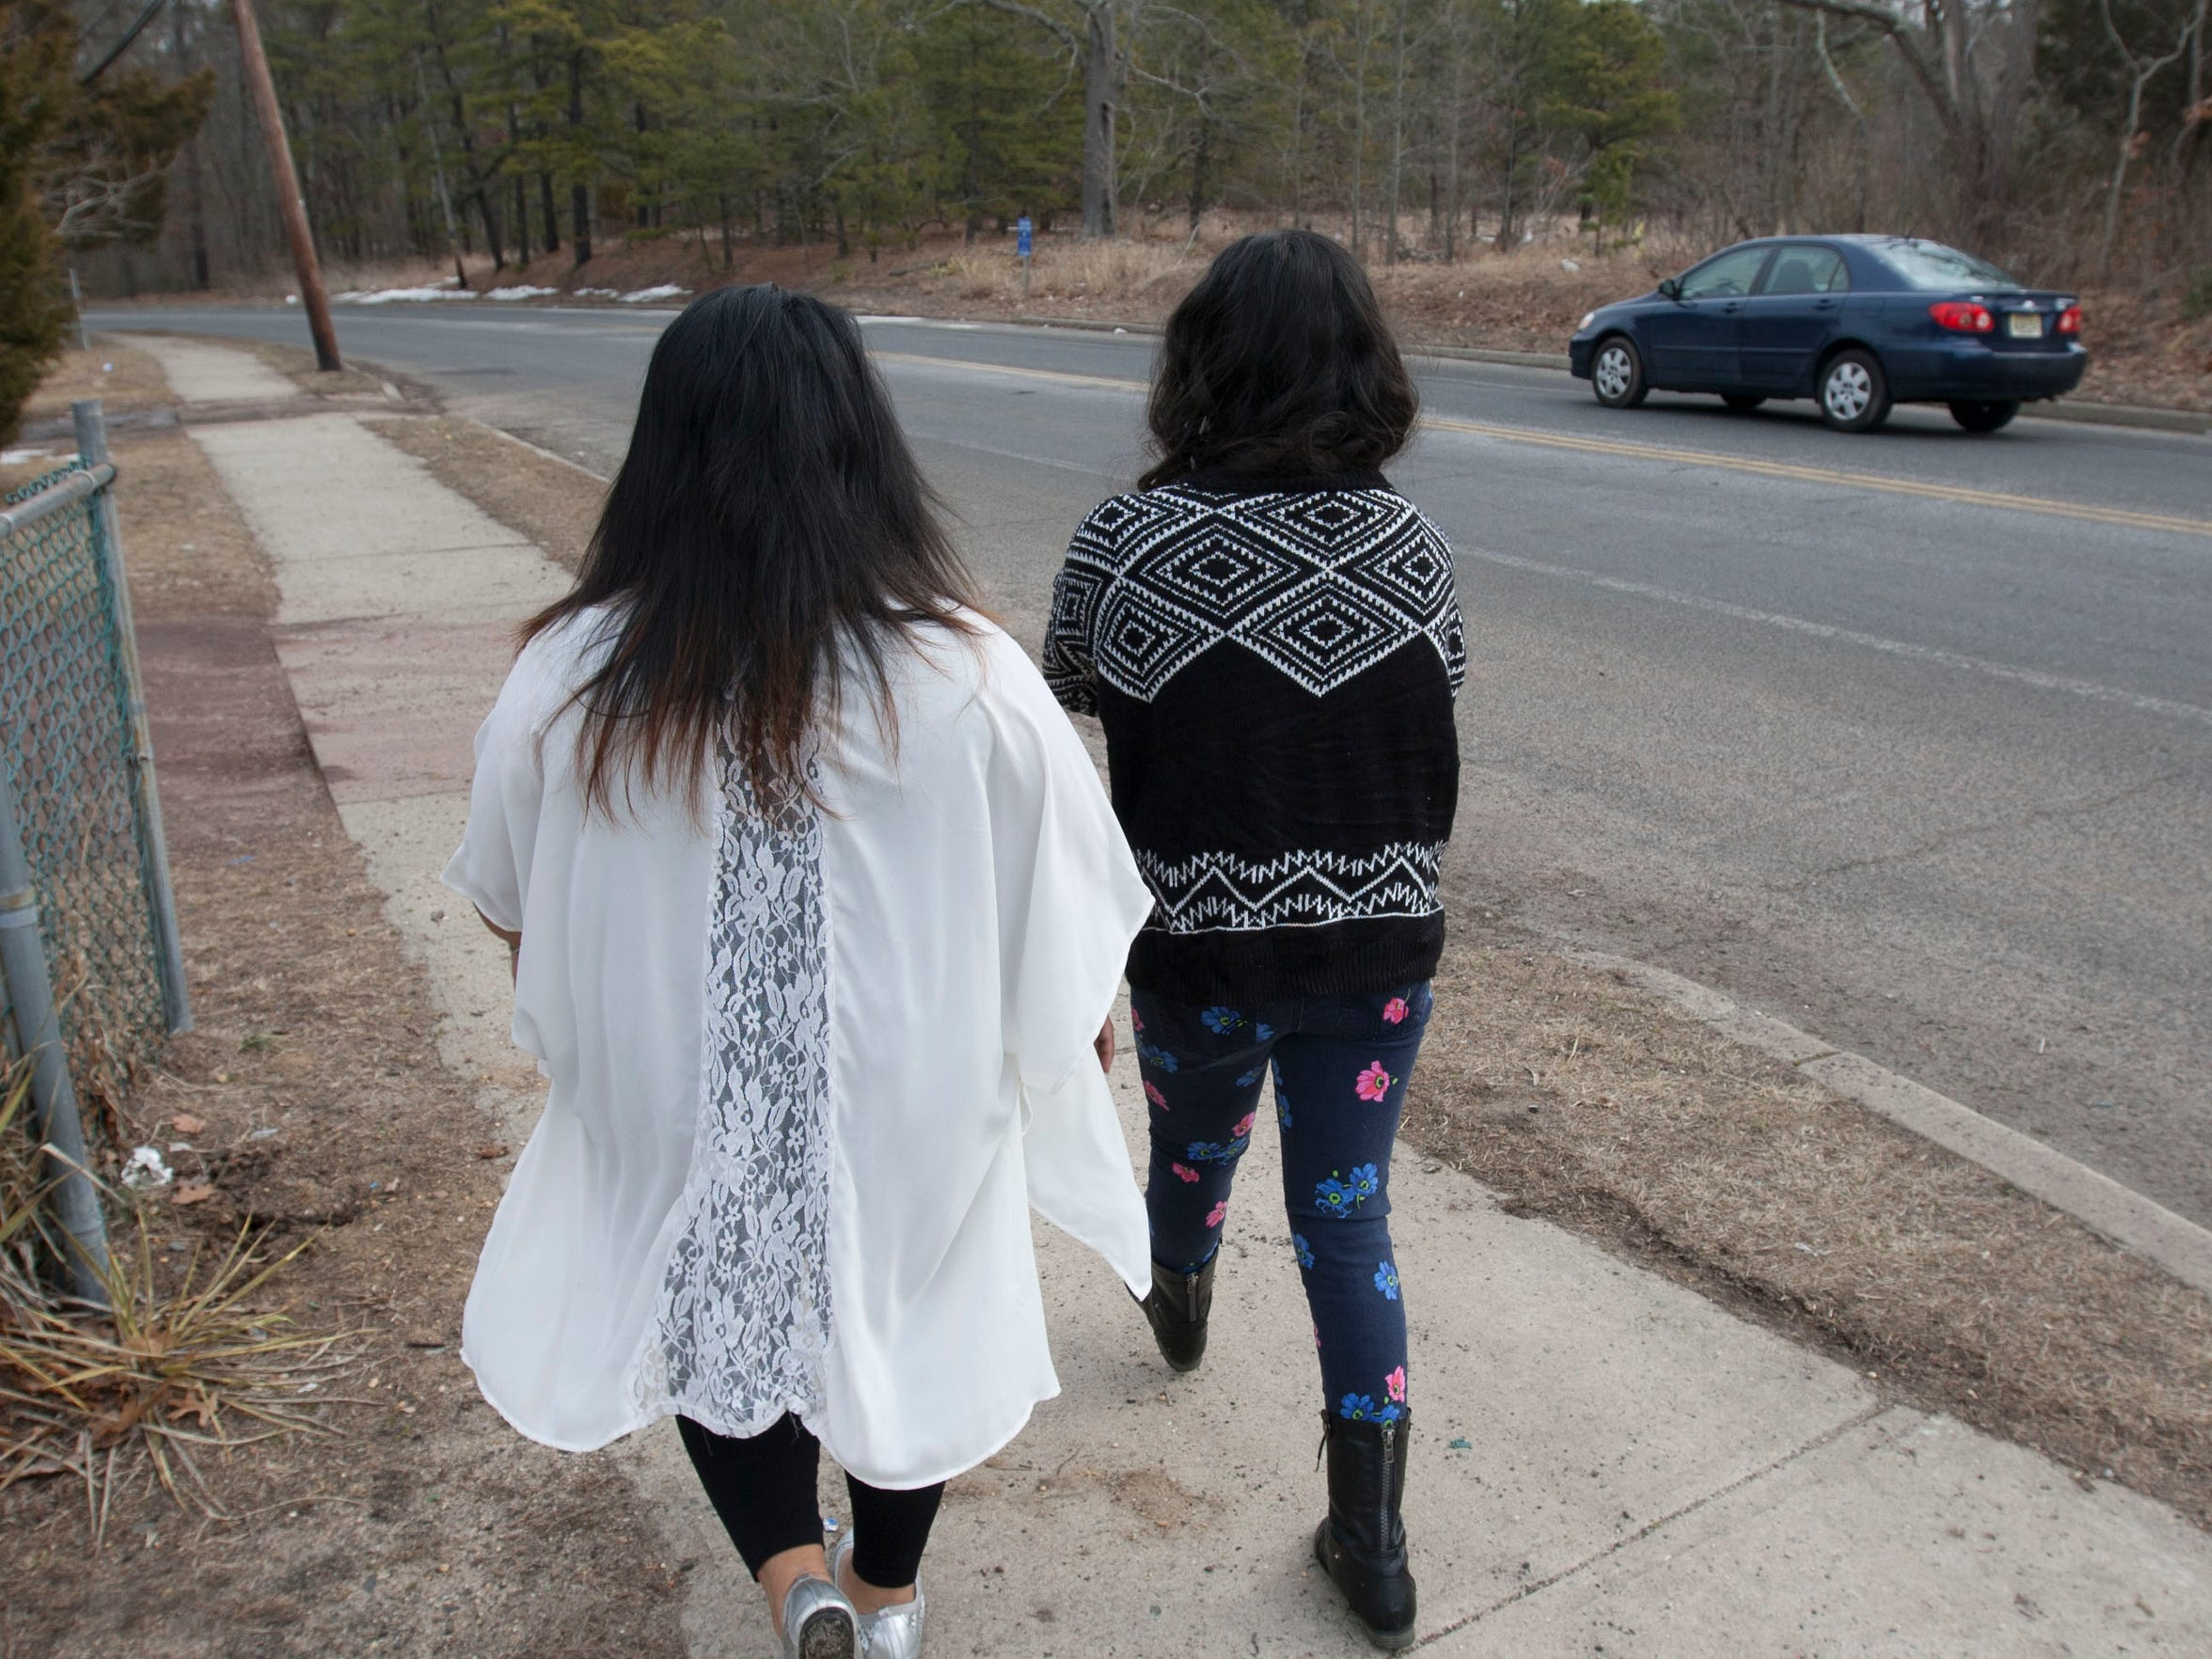 Alberta Juarez (left), Lakewood, walks with her daughter